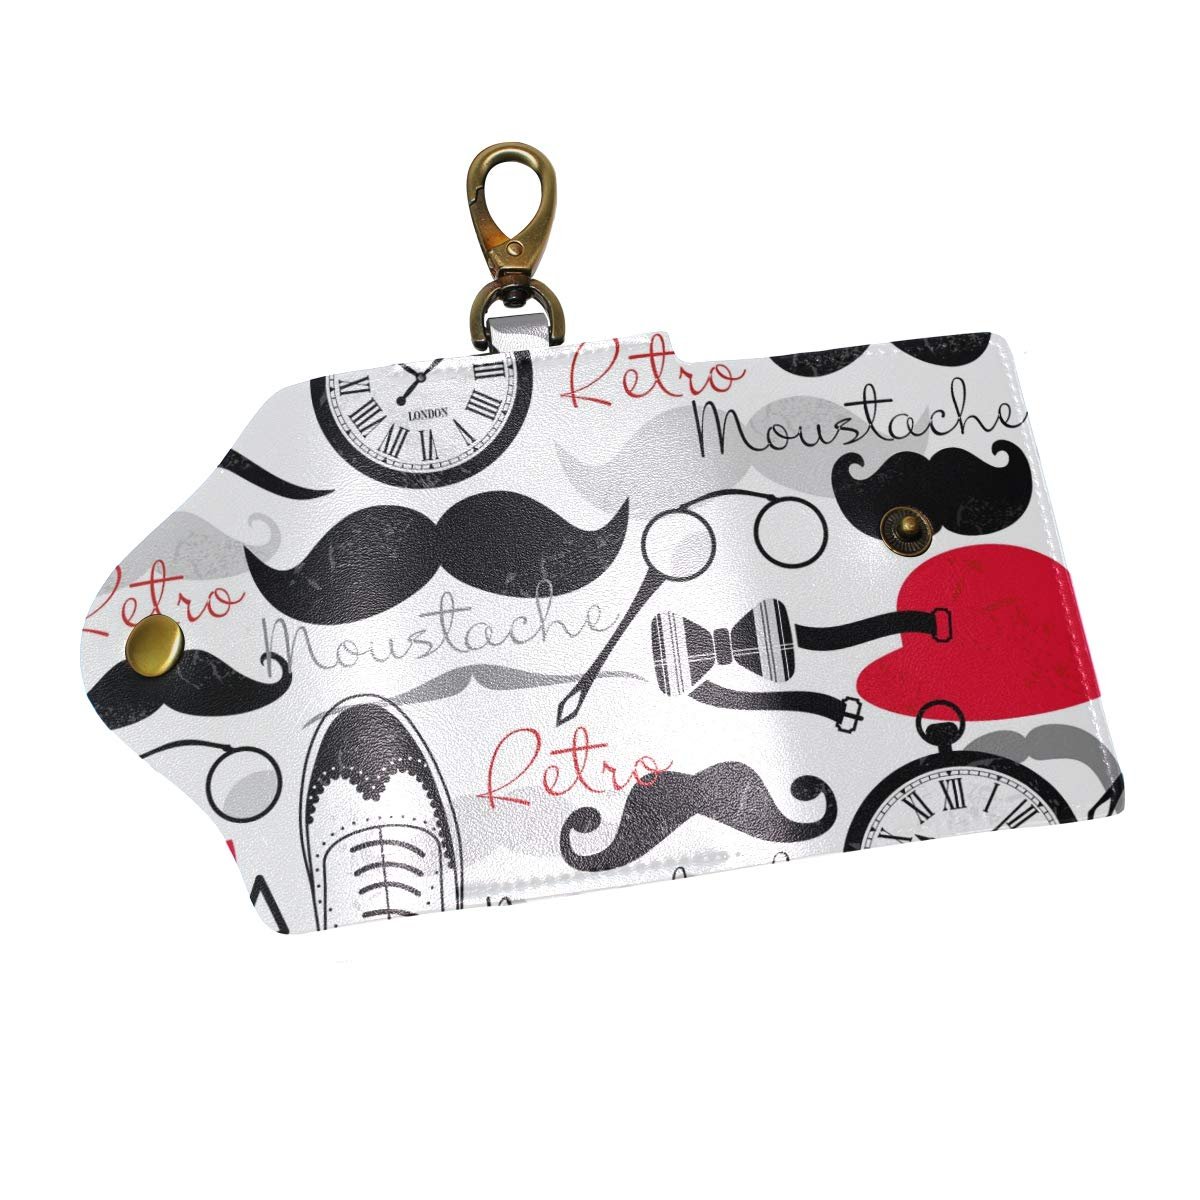 KEAKIA Polka Dots Leather Key Case Wallets Tri-fold Key Holder Keychains with 6 Hooks 2 Slot Snap Closure for Men Women